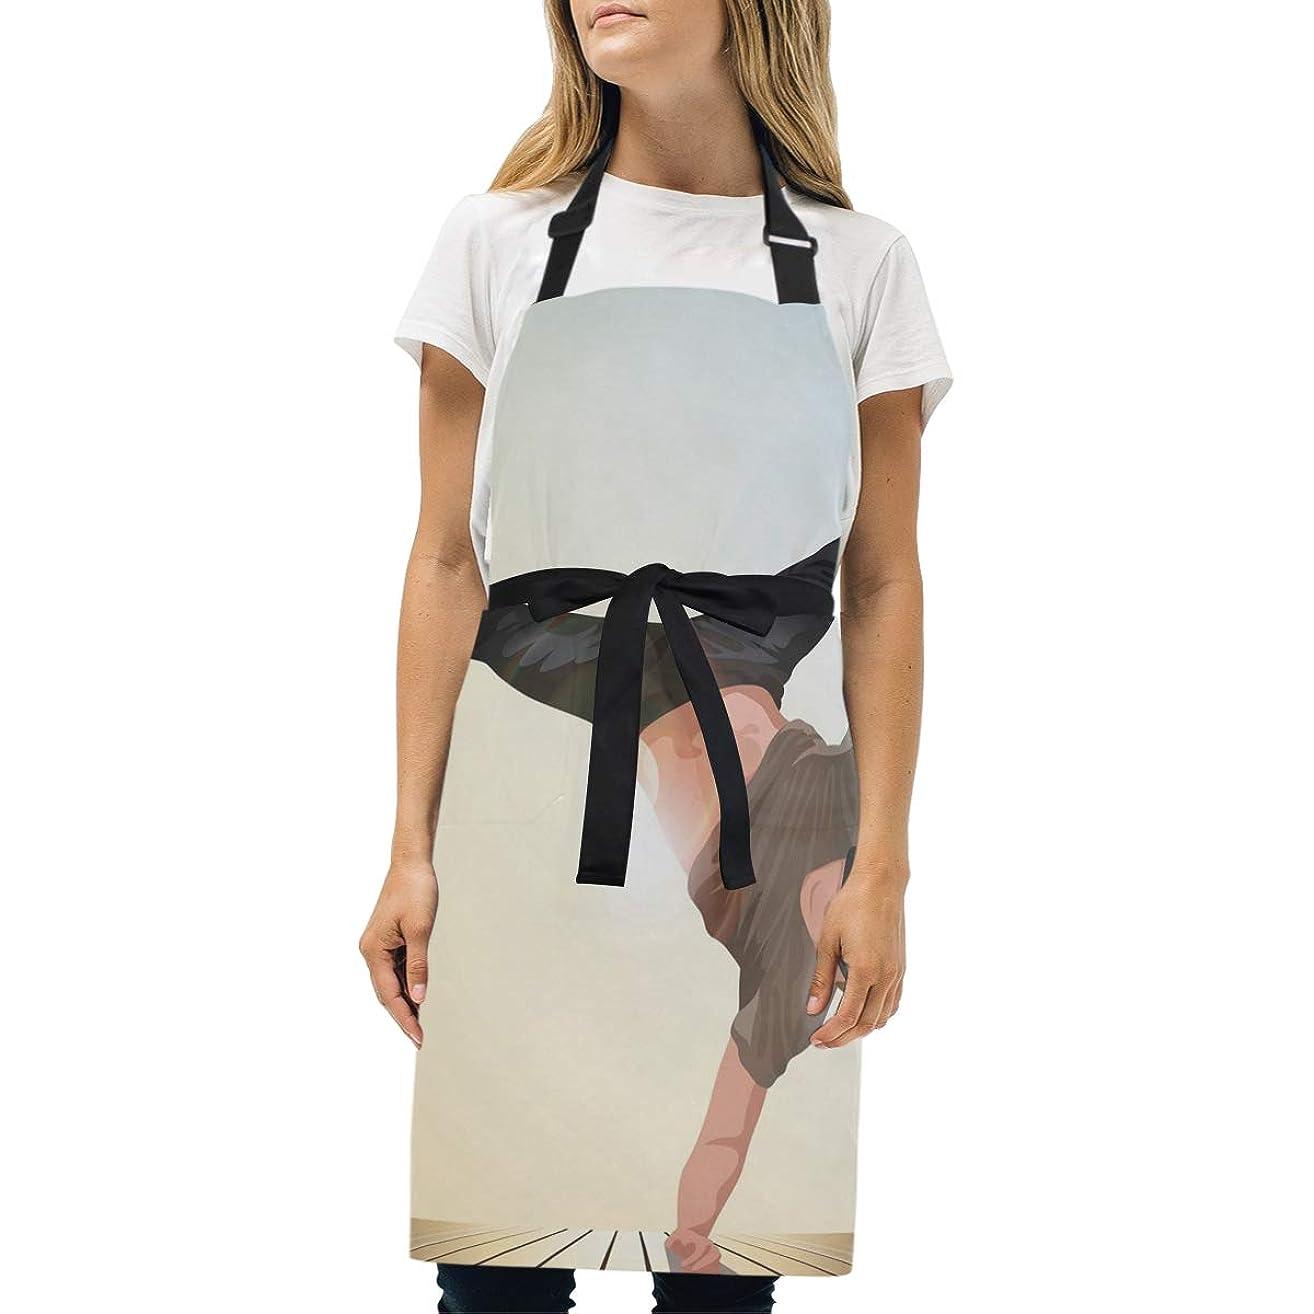 Womens Aprons Hip Hop Dancer Kitchen Bib Aprons with Pockets Adjustable Buckle on Neck